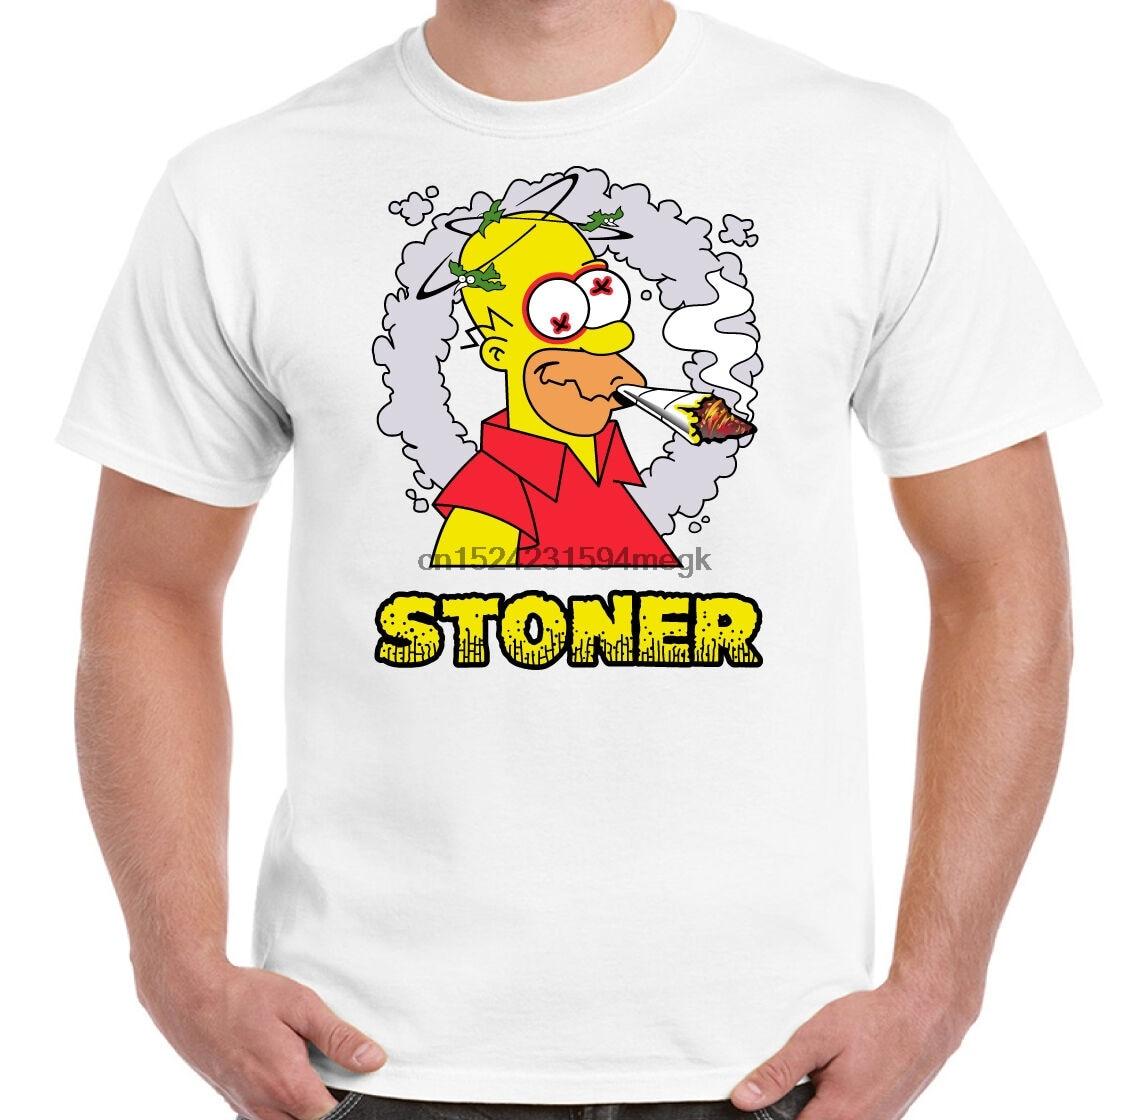 Kiffer Lustiges camiseta Gras Porro